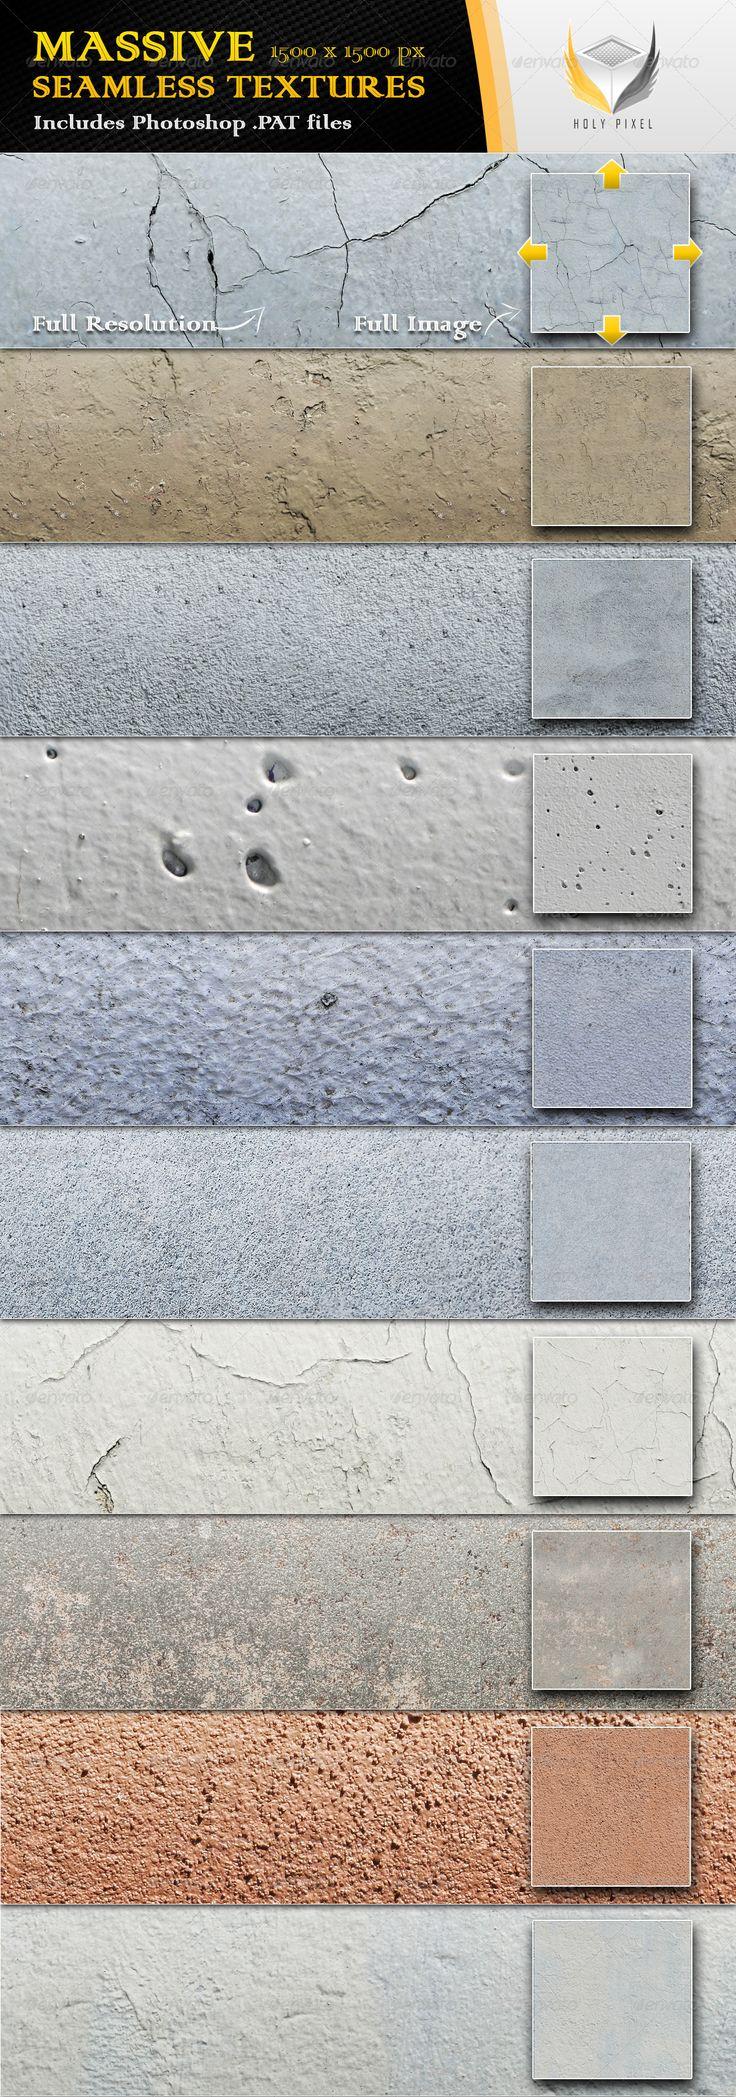 Textures architecture roads roads dirt road texture seamless - 10 Seamless Plain Surface Textures